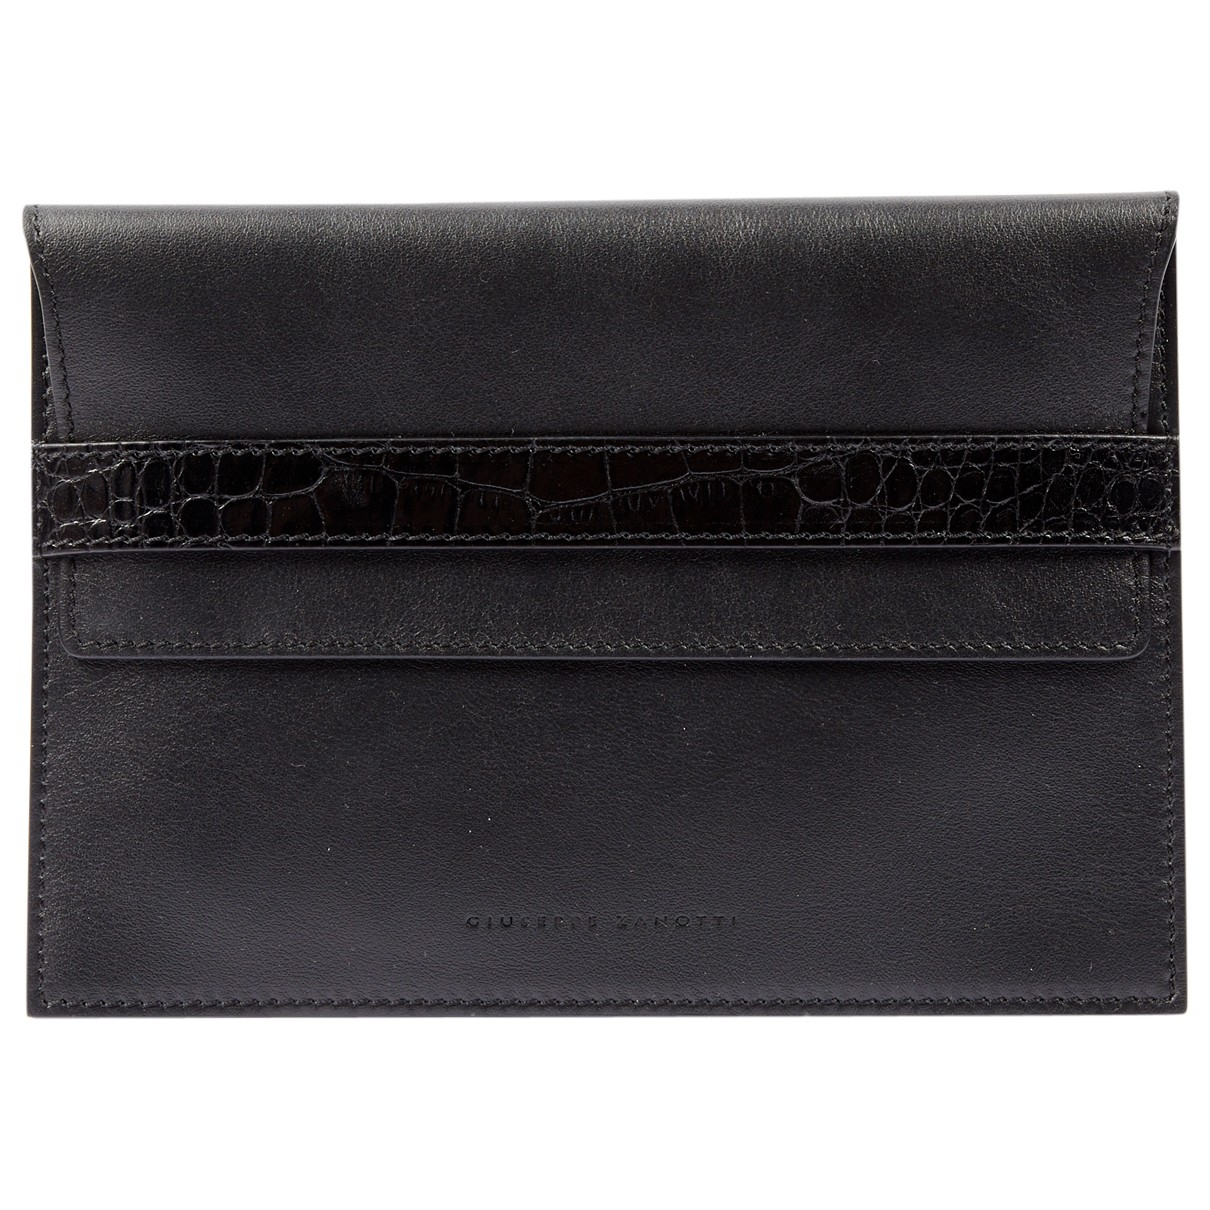 Giuseppe Zanotti \N Black Leather Clutch bag for Women \N